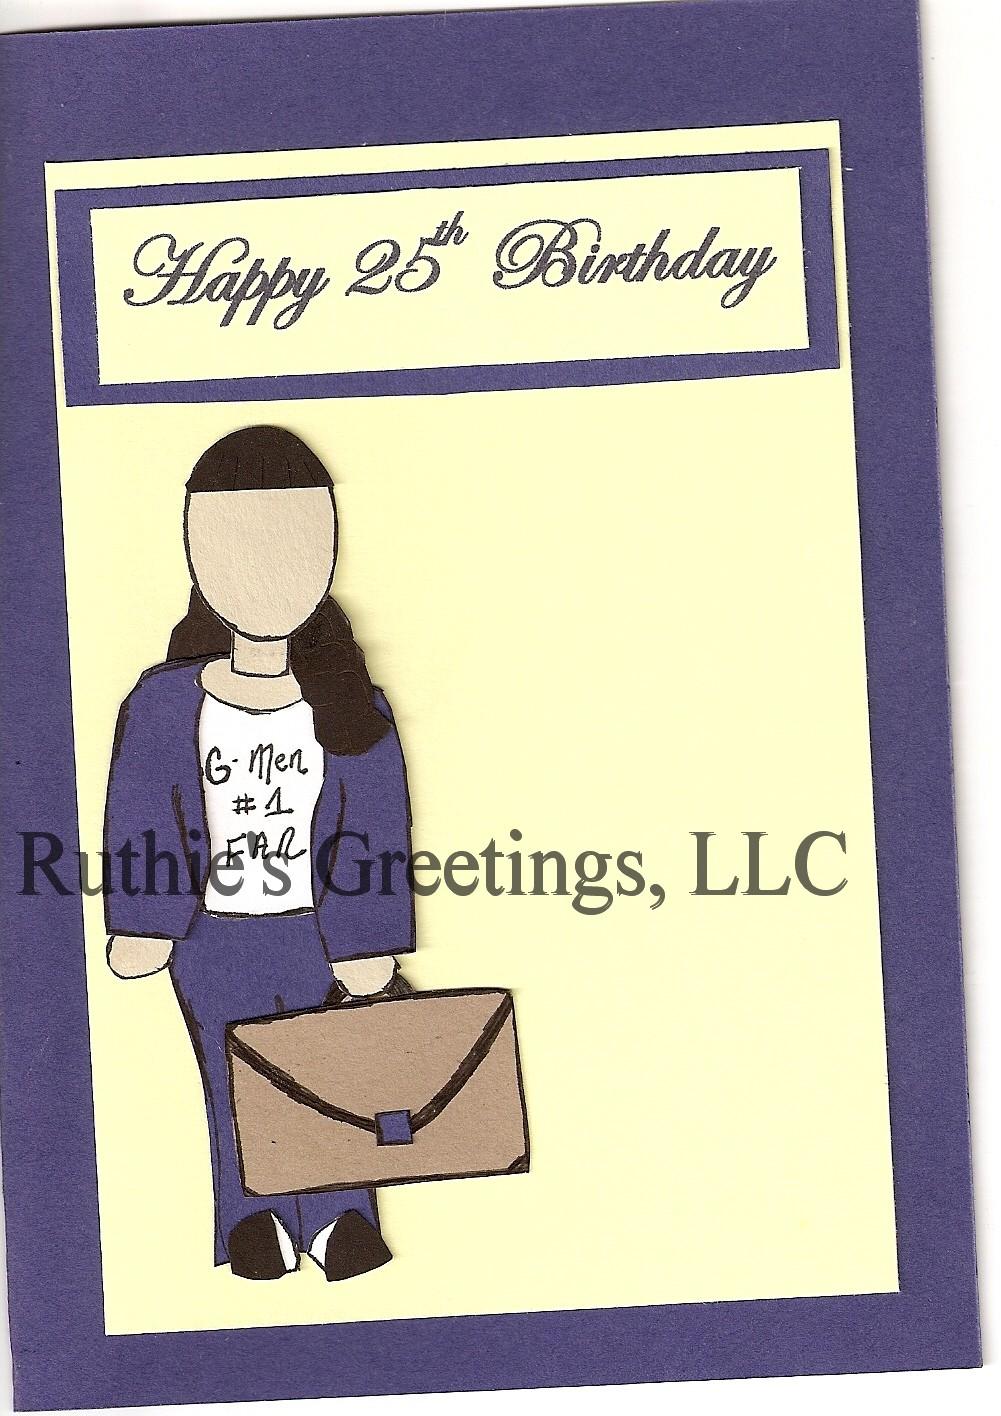 Happy 25th Birthday Doctor Lawyer Editions